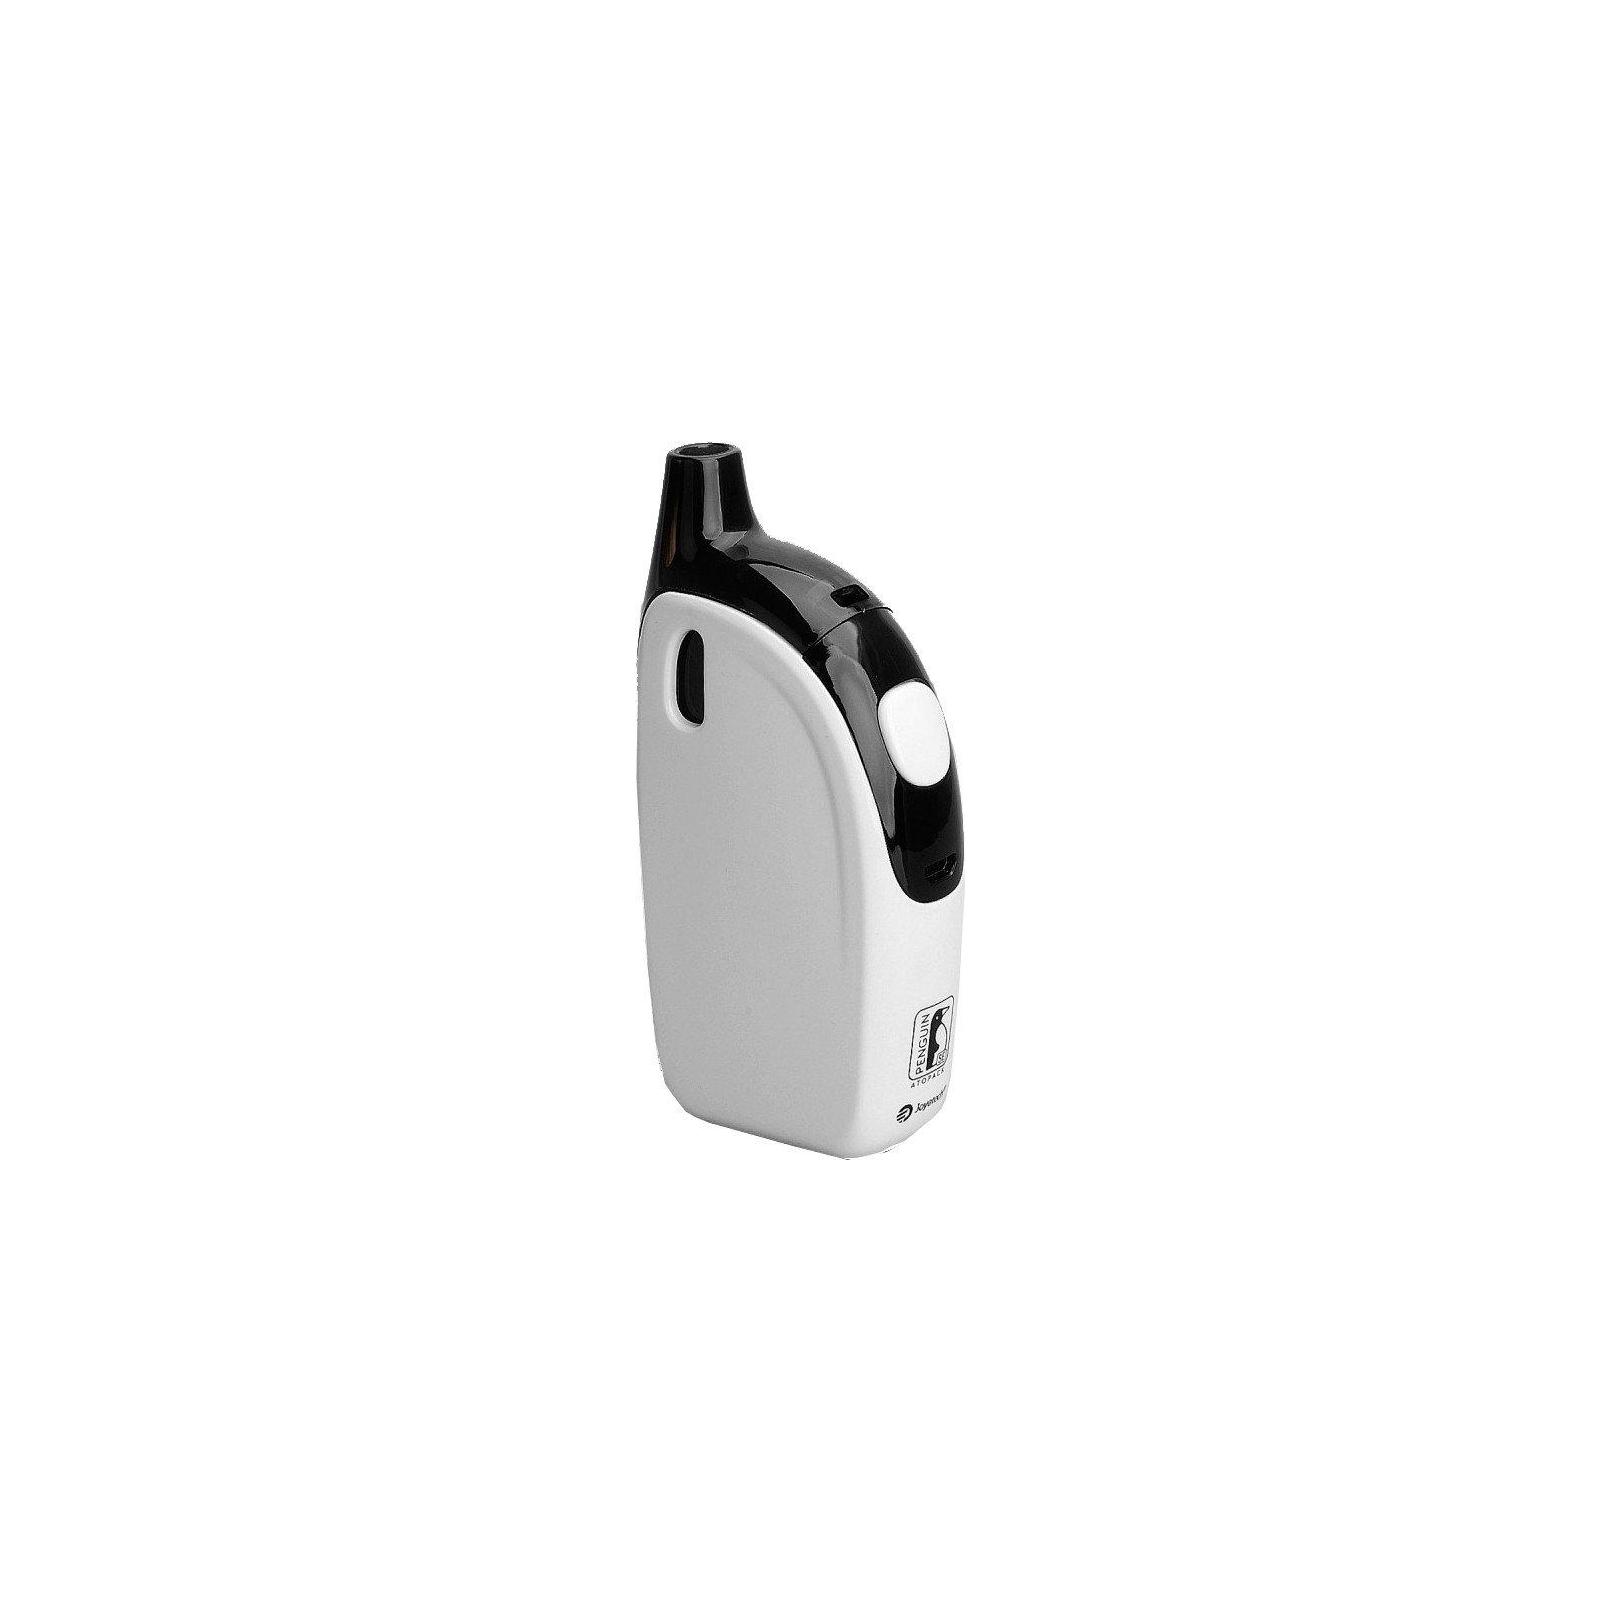 Стартовый набор Joyetech Penguin SE Kit White (JTPNGWB)